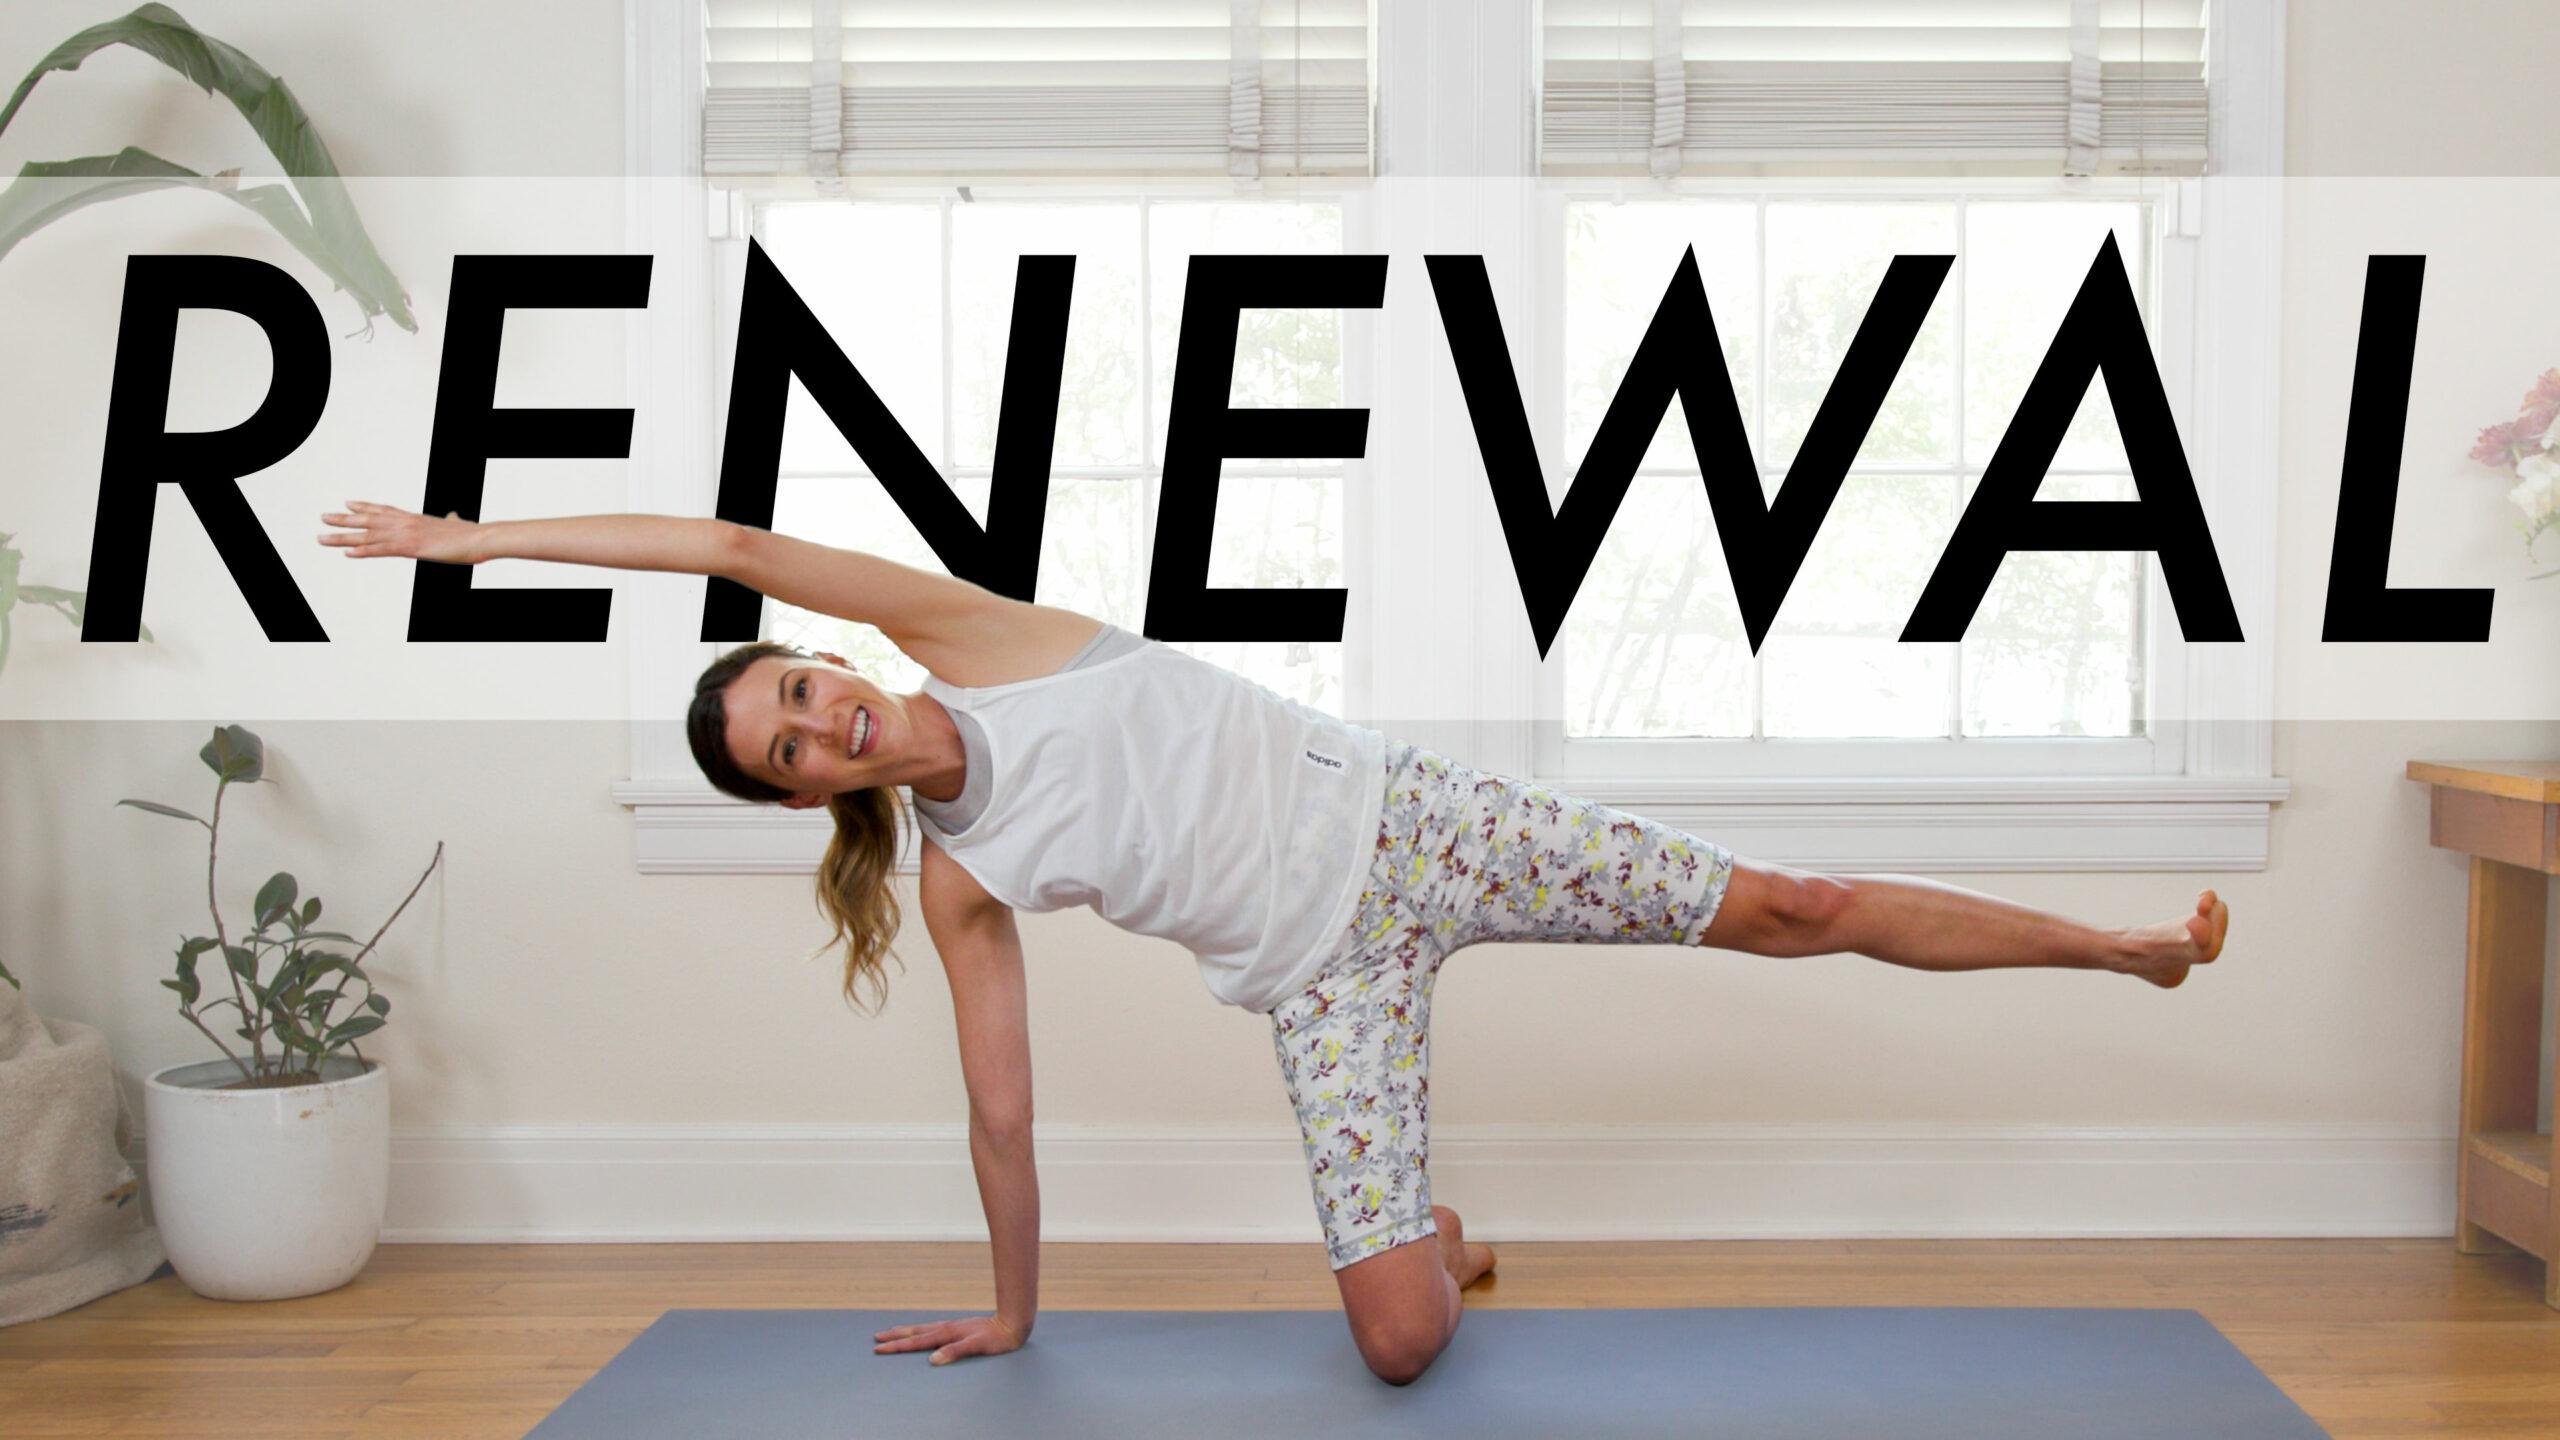 Yoga For Renewal - YouTube Video